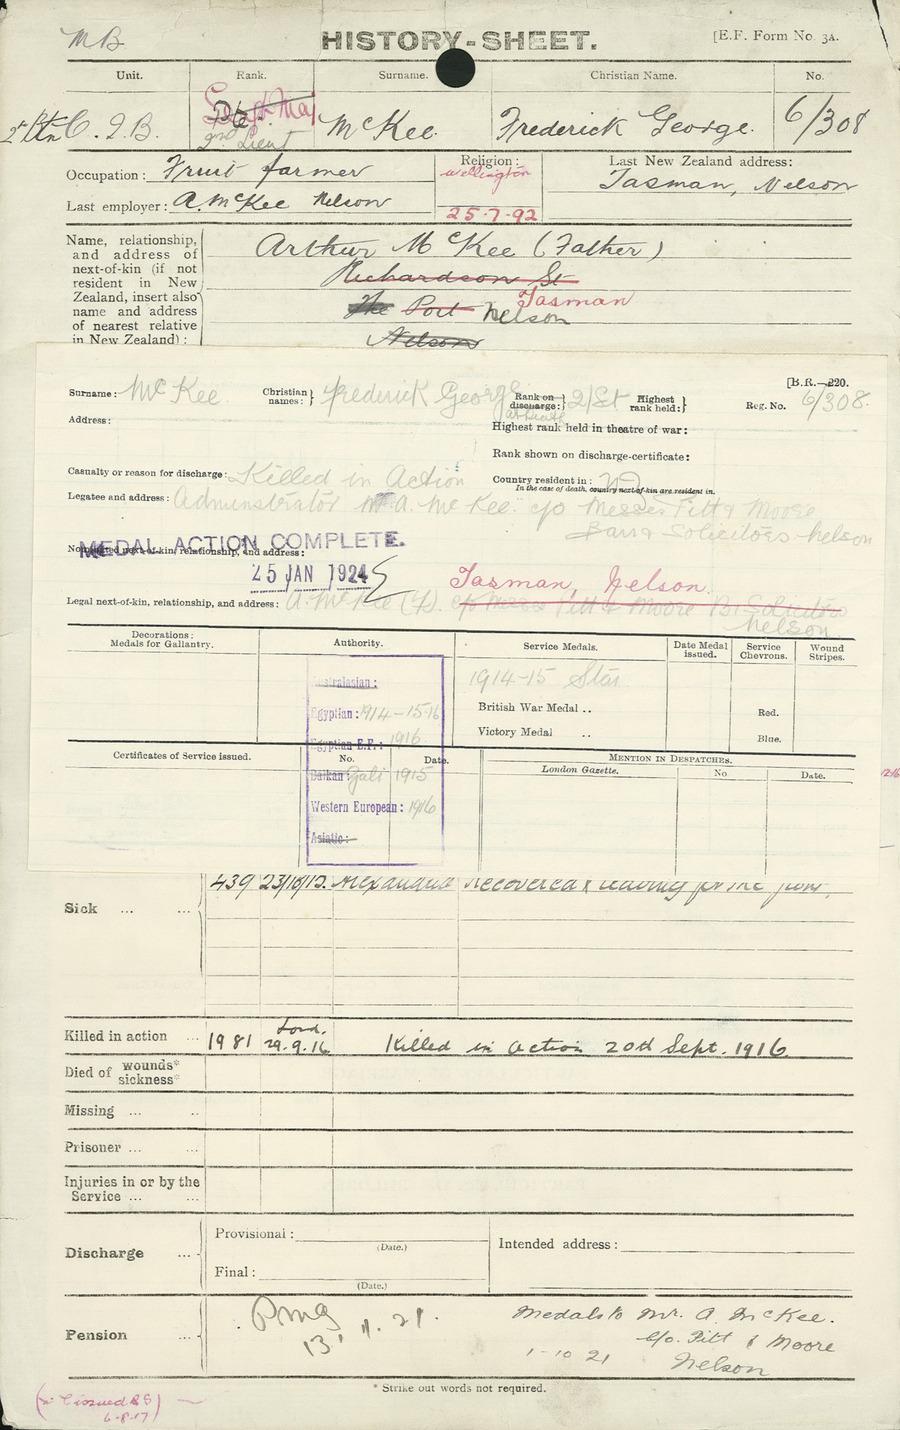 McKee FG History Sheet